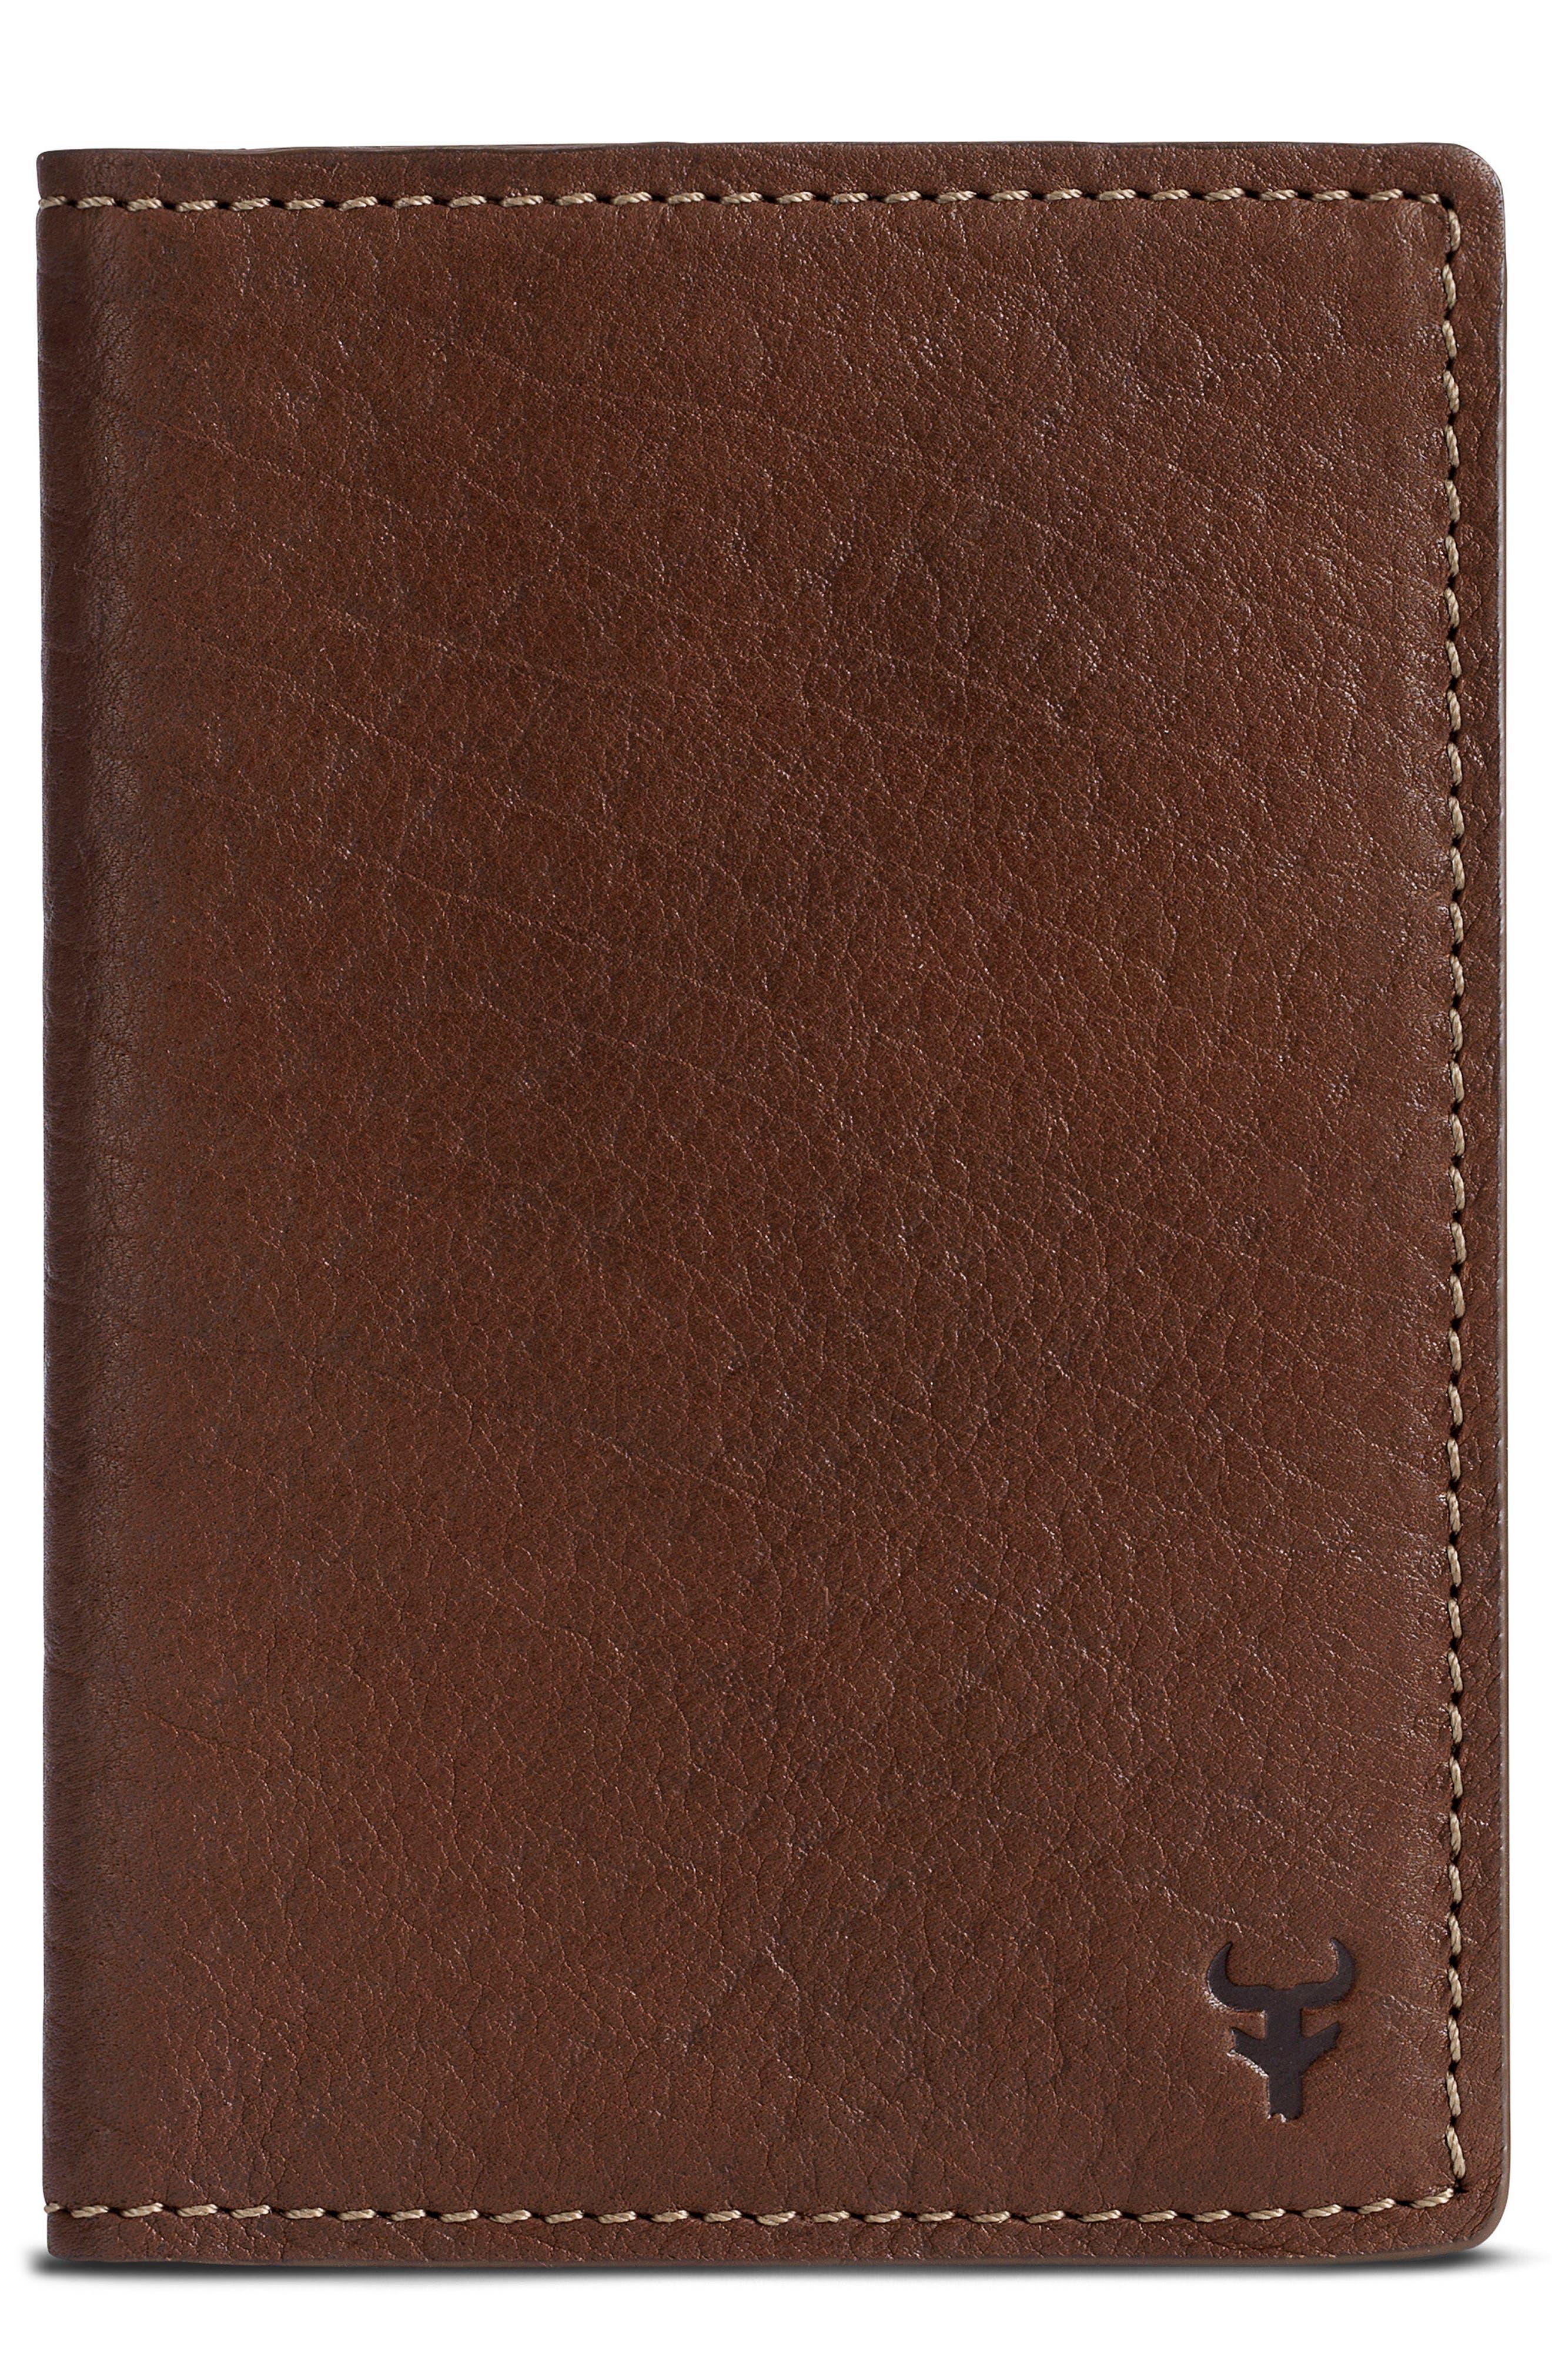 Trask Jackson Passport Cover